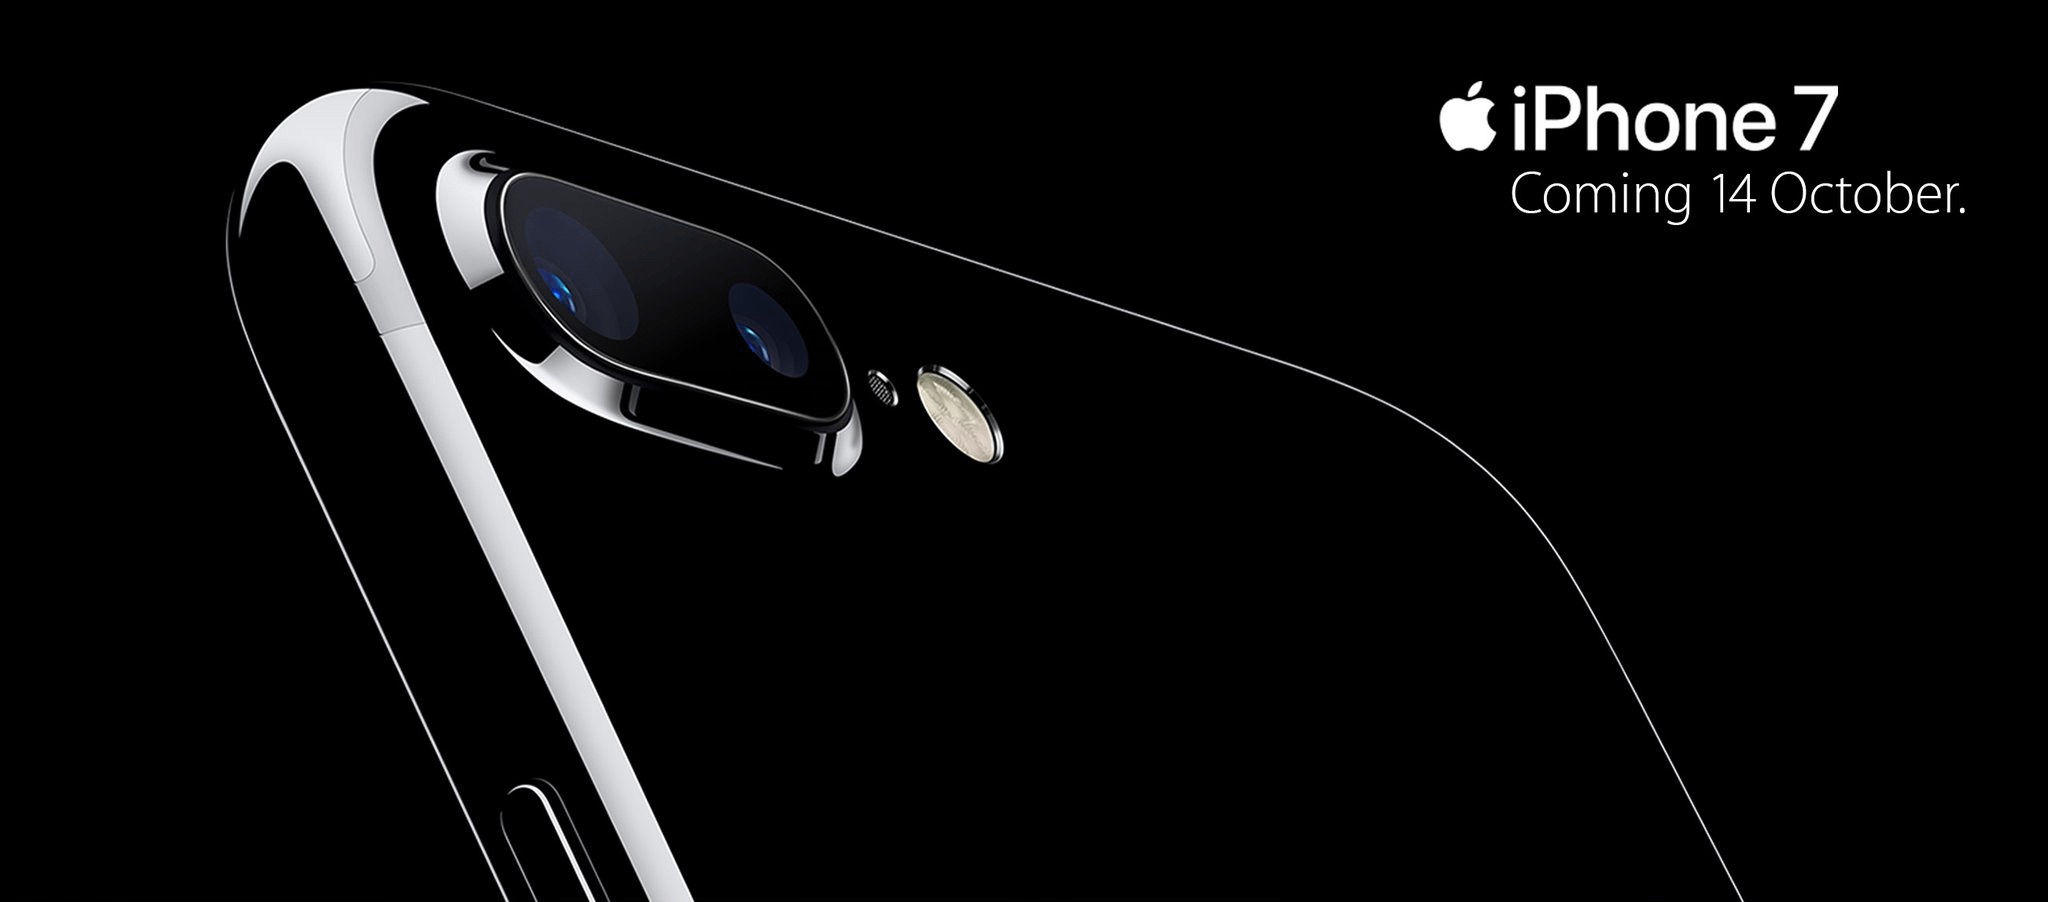 iPhone 7 MTN pre-orders now open iPhone 7